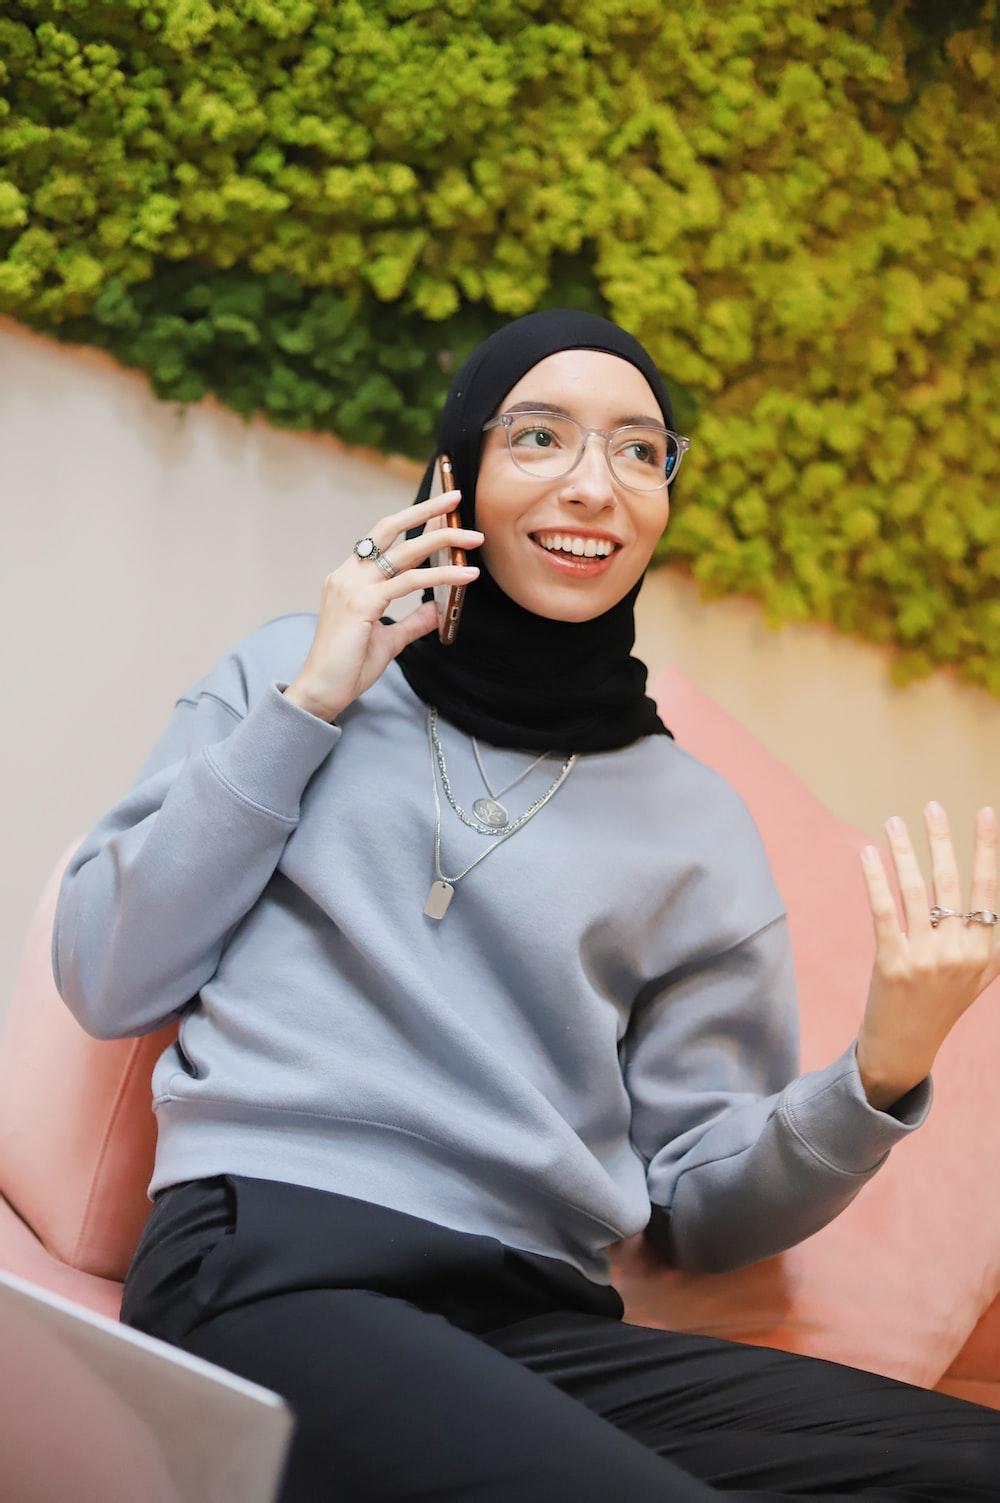 woman in gray sweater and black hijab